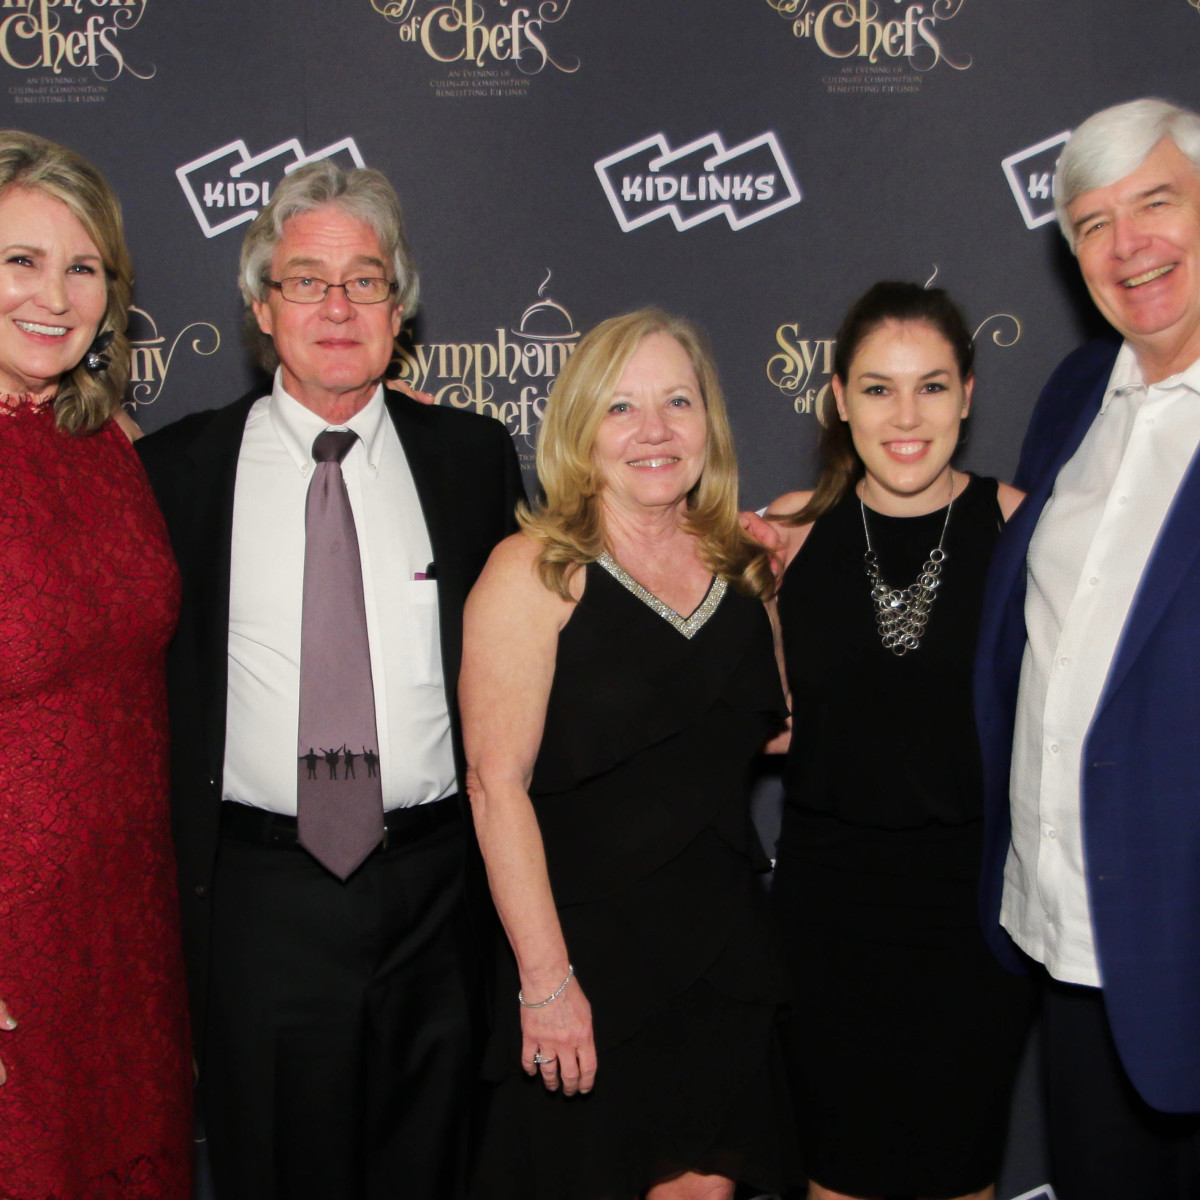 Diana Crawford, Paul G. Hill, Ginny Denmark, Maddie Benner, Jim Newton, Symphony of Chefs 2018